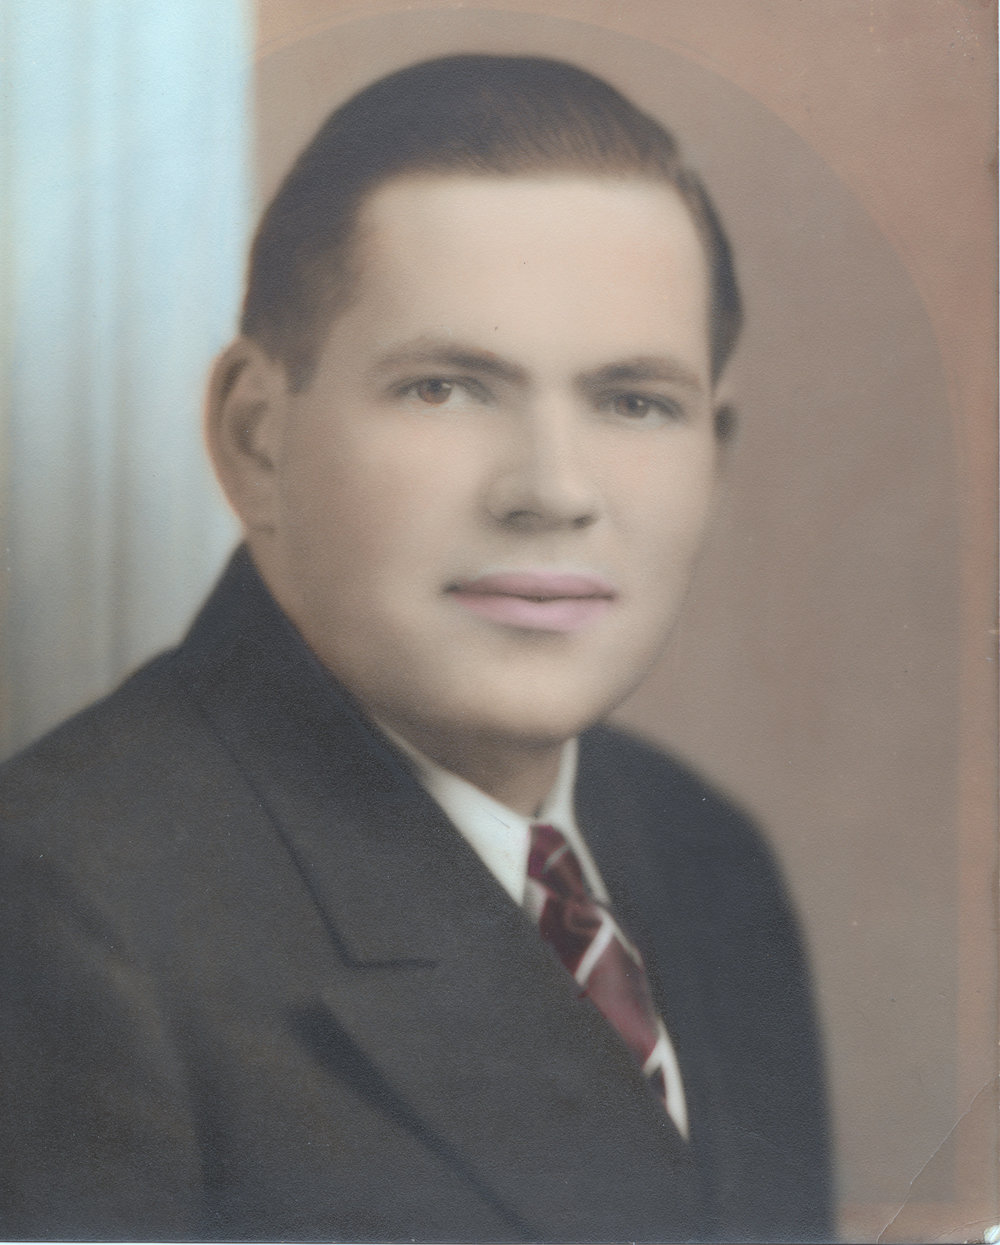 James G. Tice